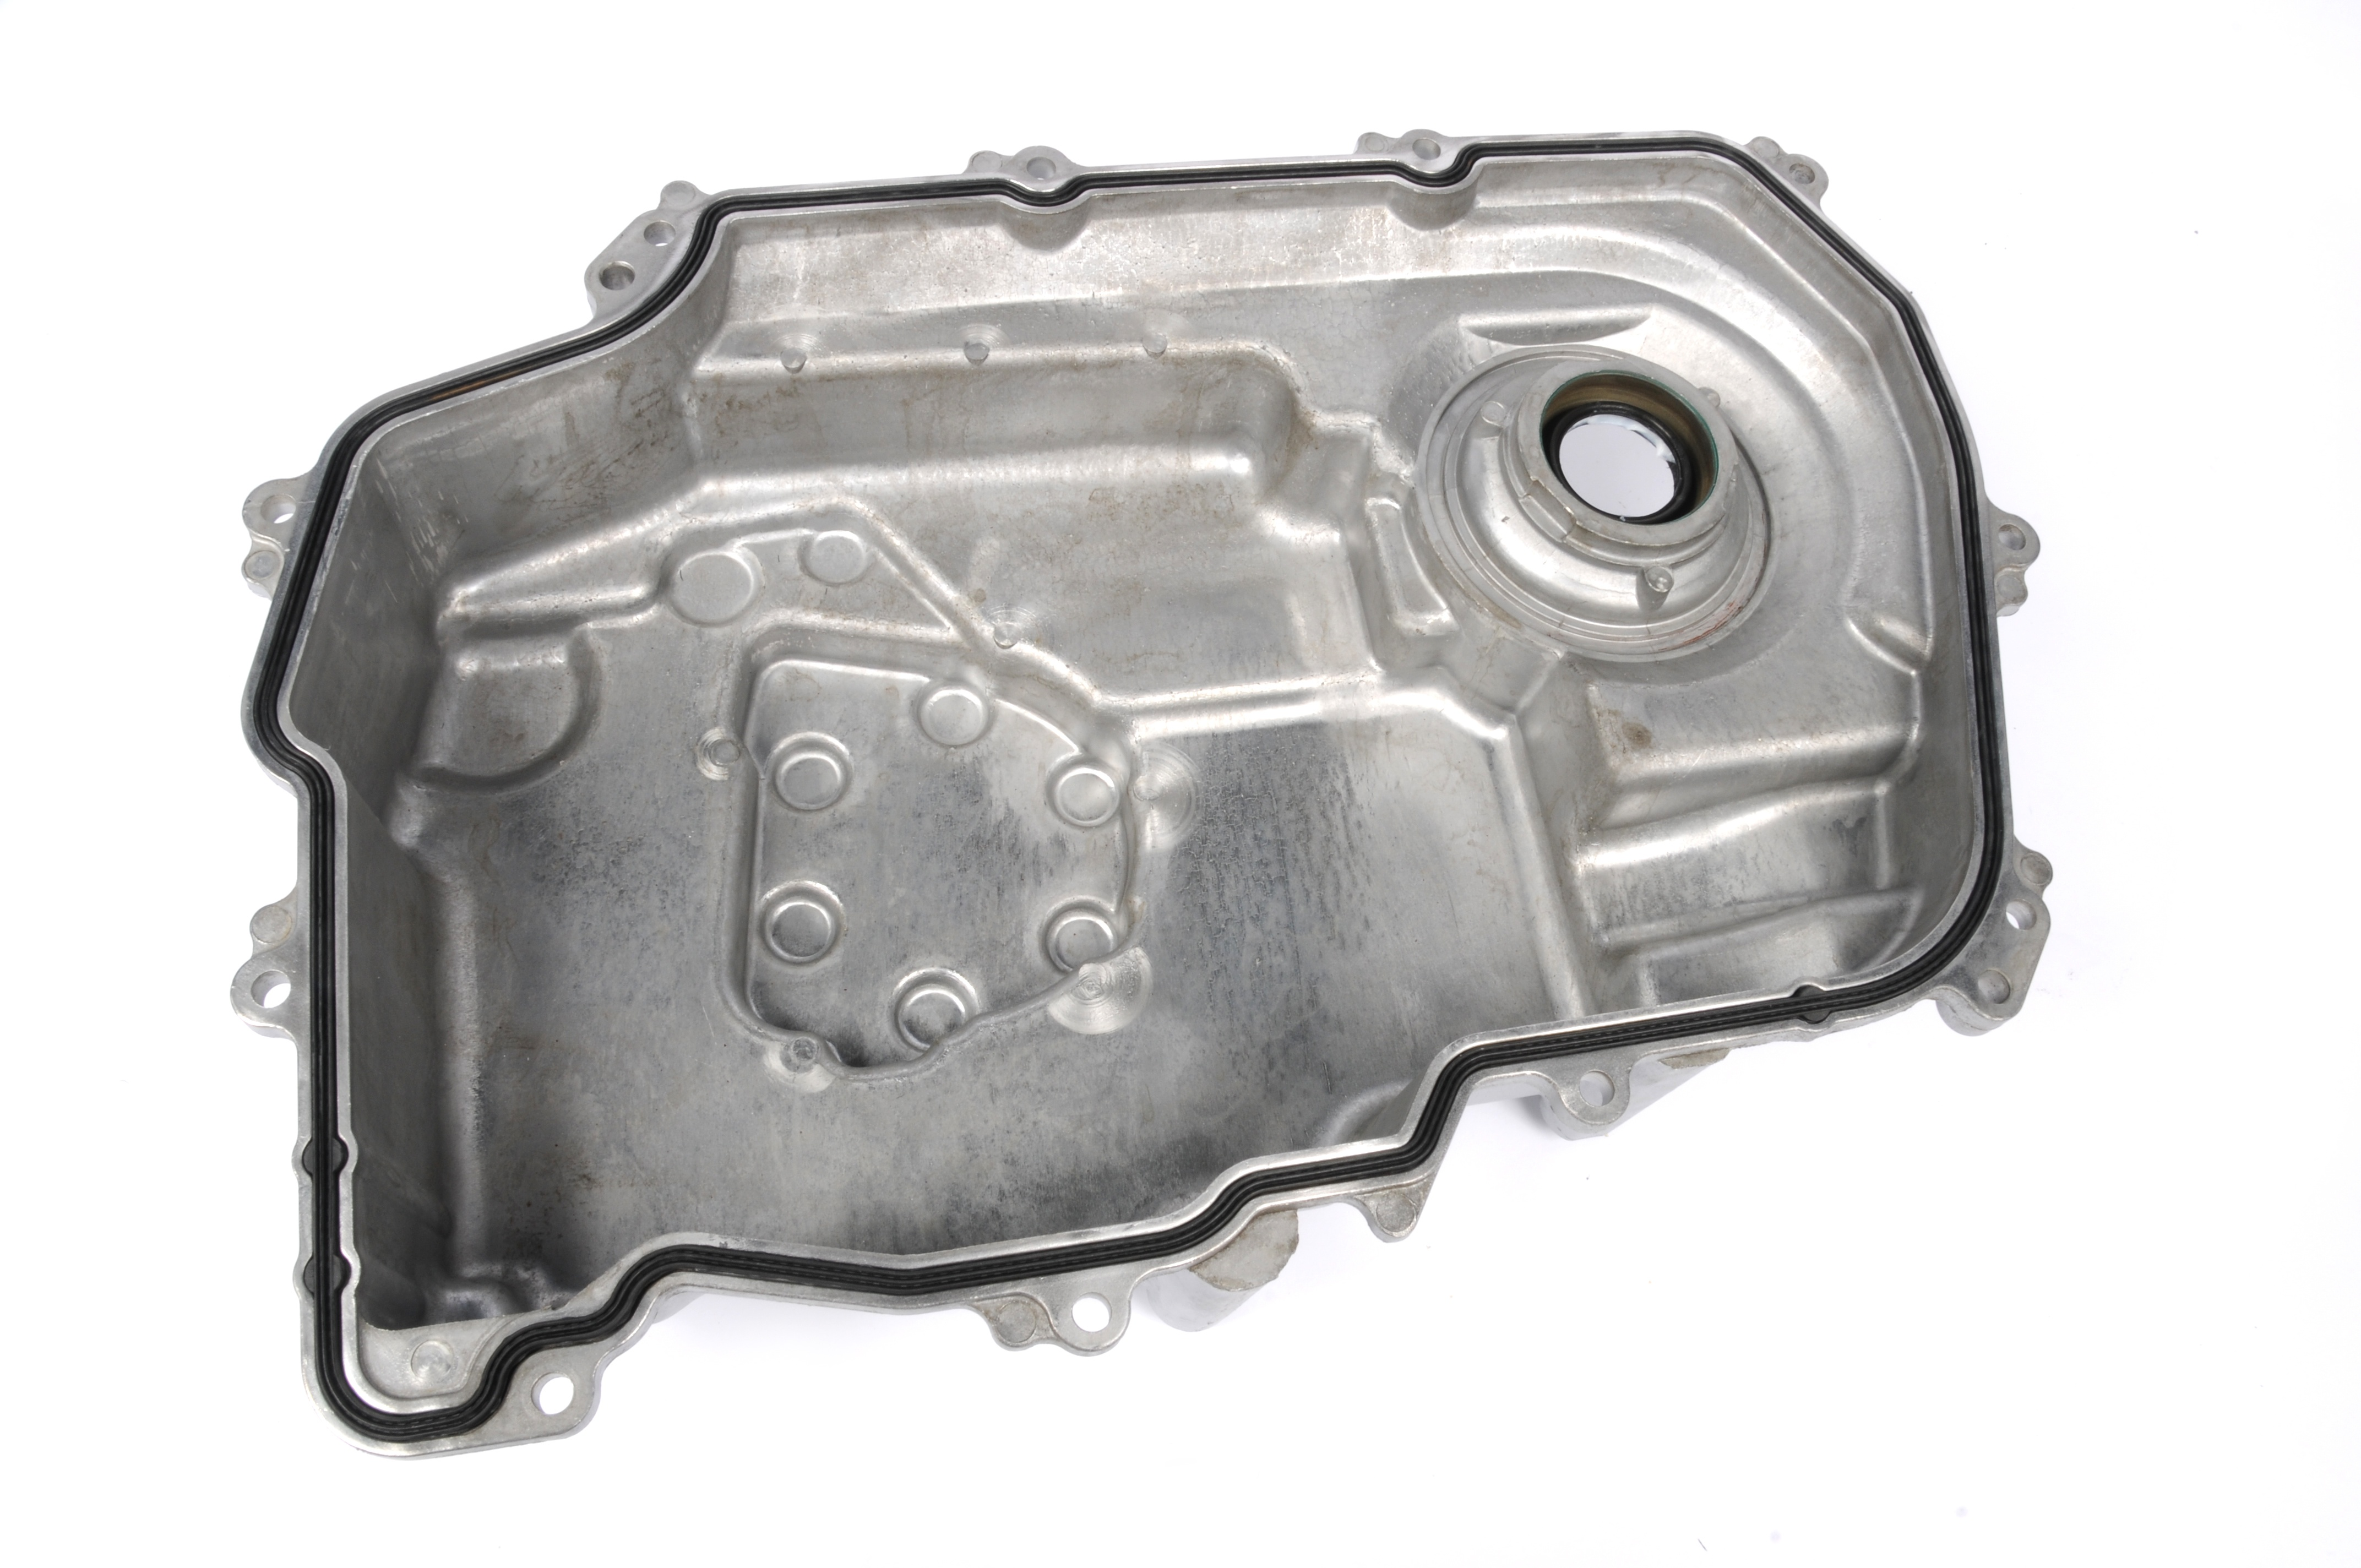 ACDELCO GM ORIGINAL EQUIPMENT - Reman Automatic Transmission Valve Body Cover - DCB 19329239